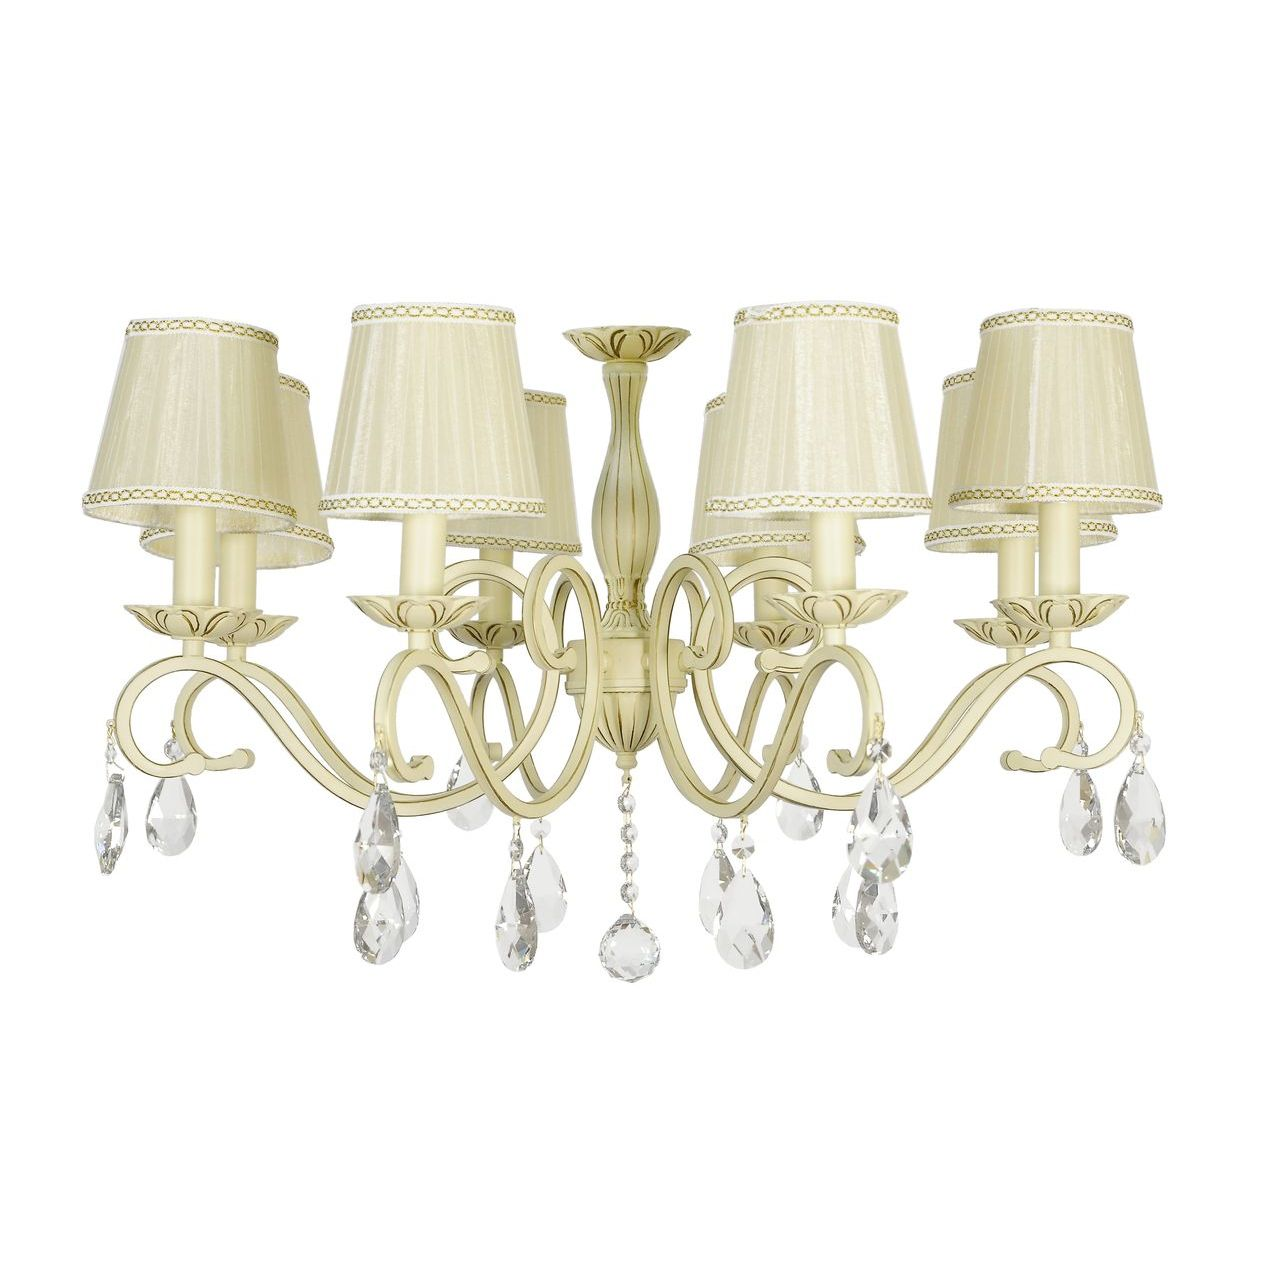 Потолочный светильник Lucia Tucci Bari 370.8 Cream White, E14, 320 Вт потолочная люстра lucia tucci bari 370 8 cream white